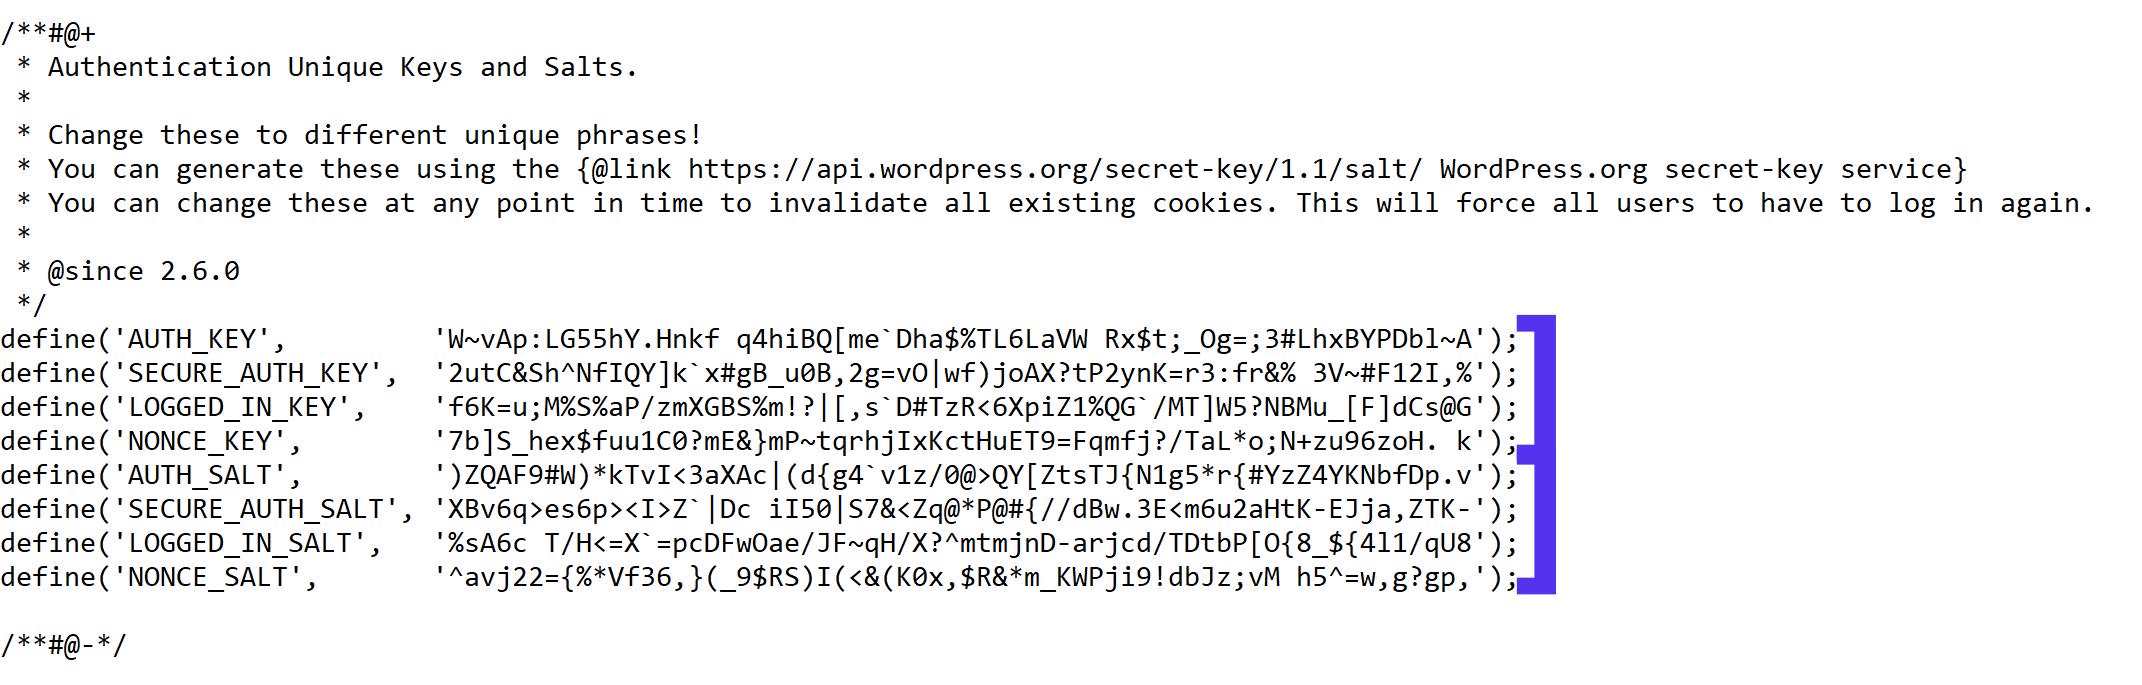 wordpress-website-blog-salts-keys-wp-config-screenshot-linux